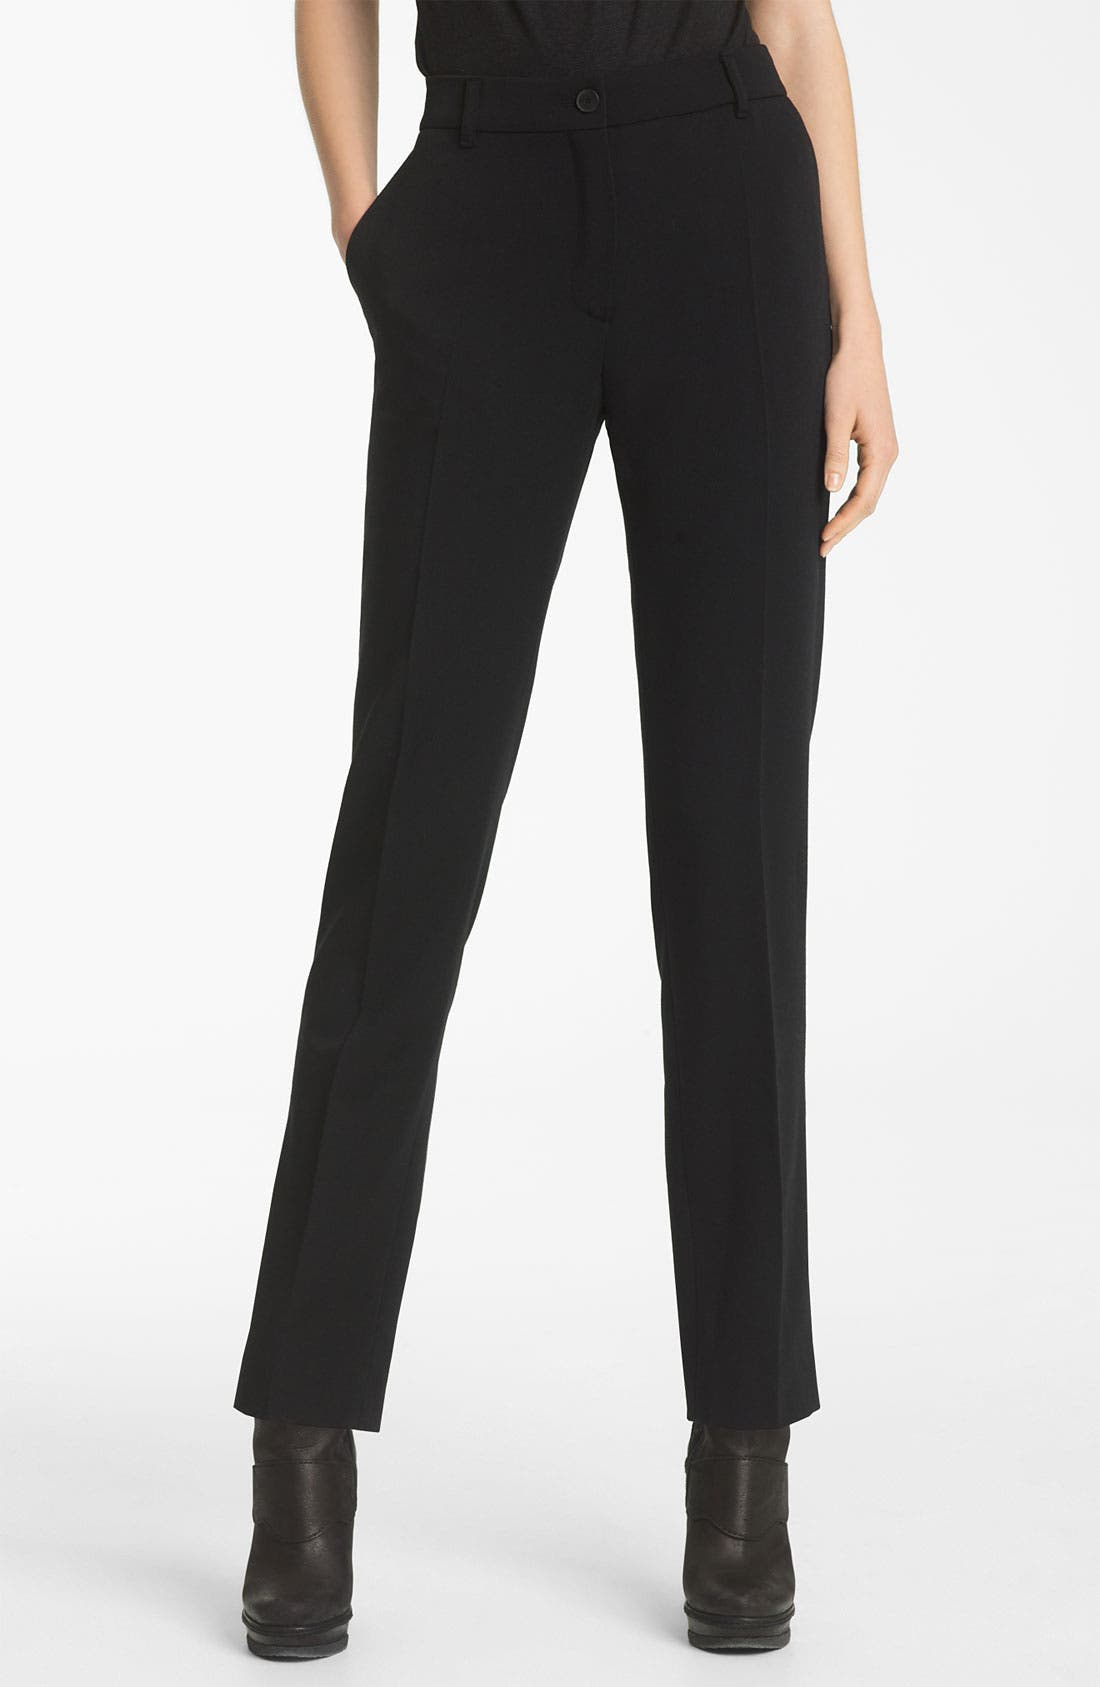 Alternate Image 1 Selected - Jean Paul Gaultier Straight Leg Pants